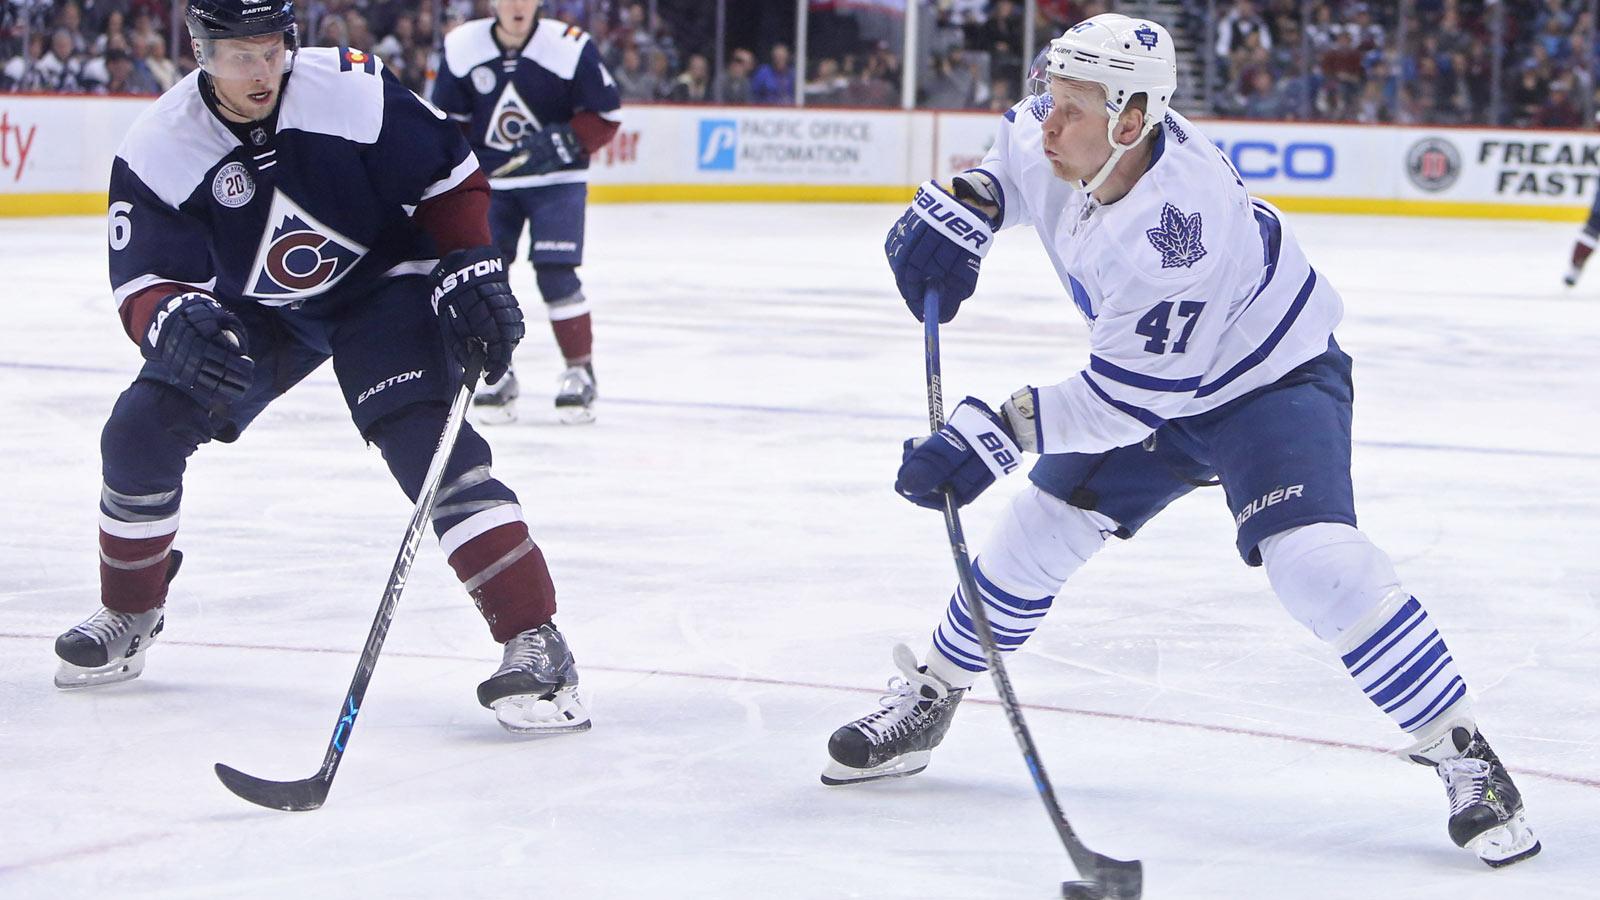 Leo Komarov developing into All-Star, locker room jester with Maple Leafs